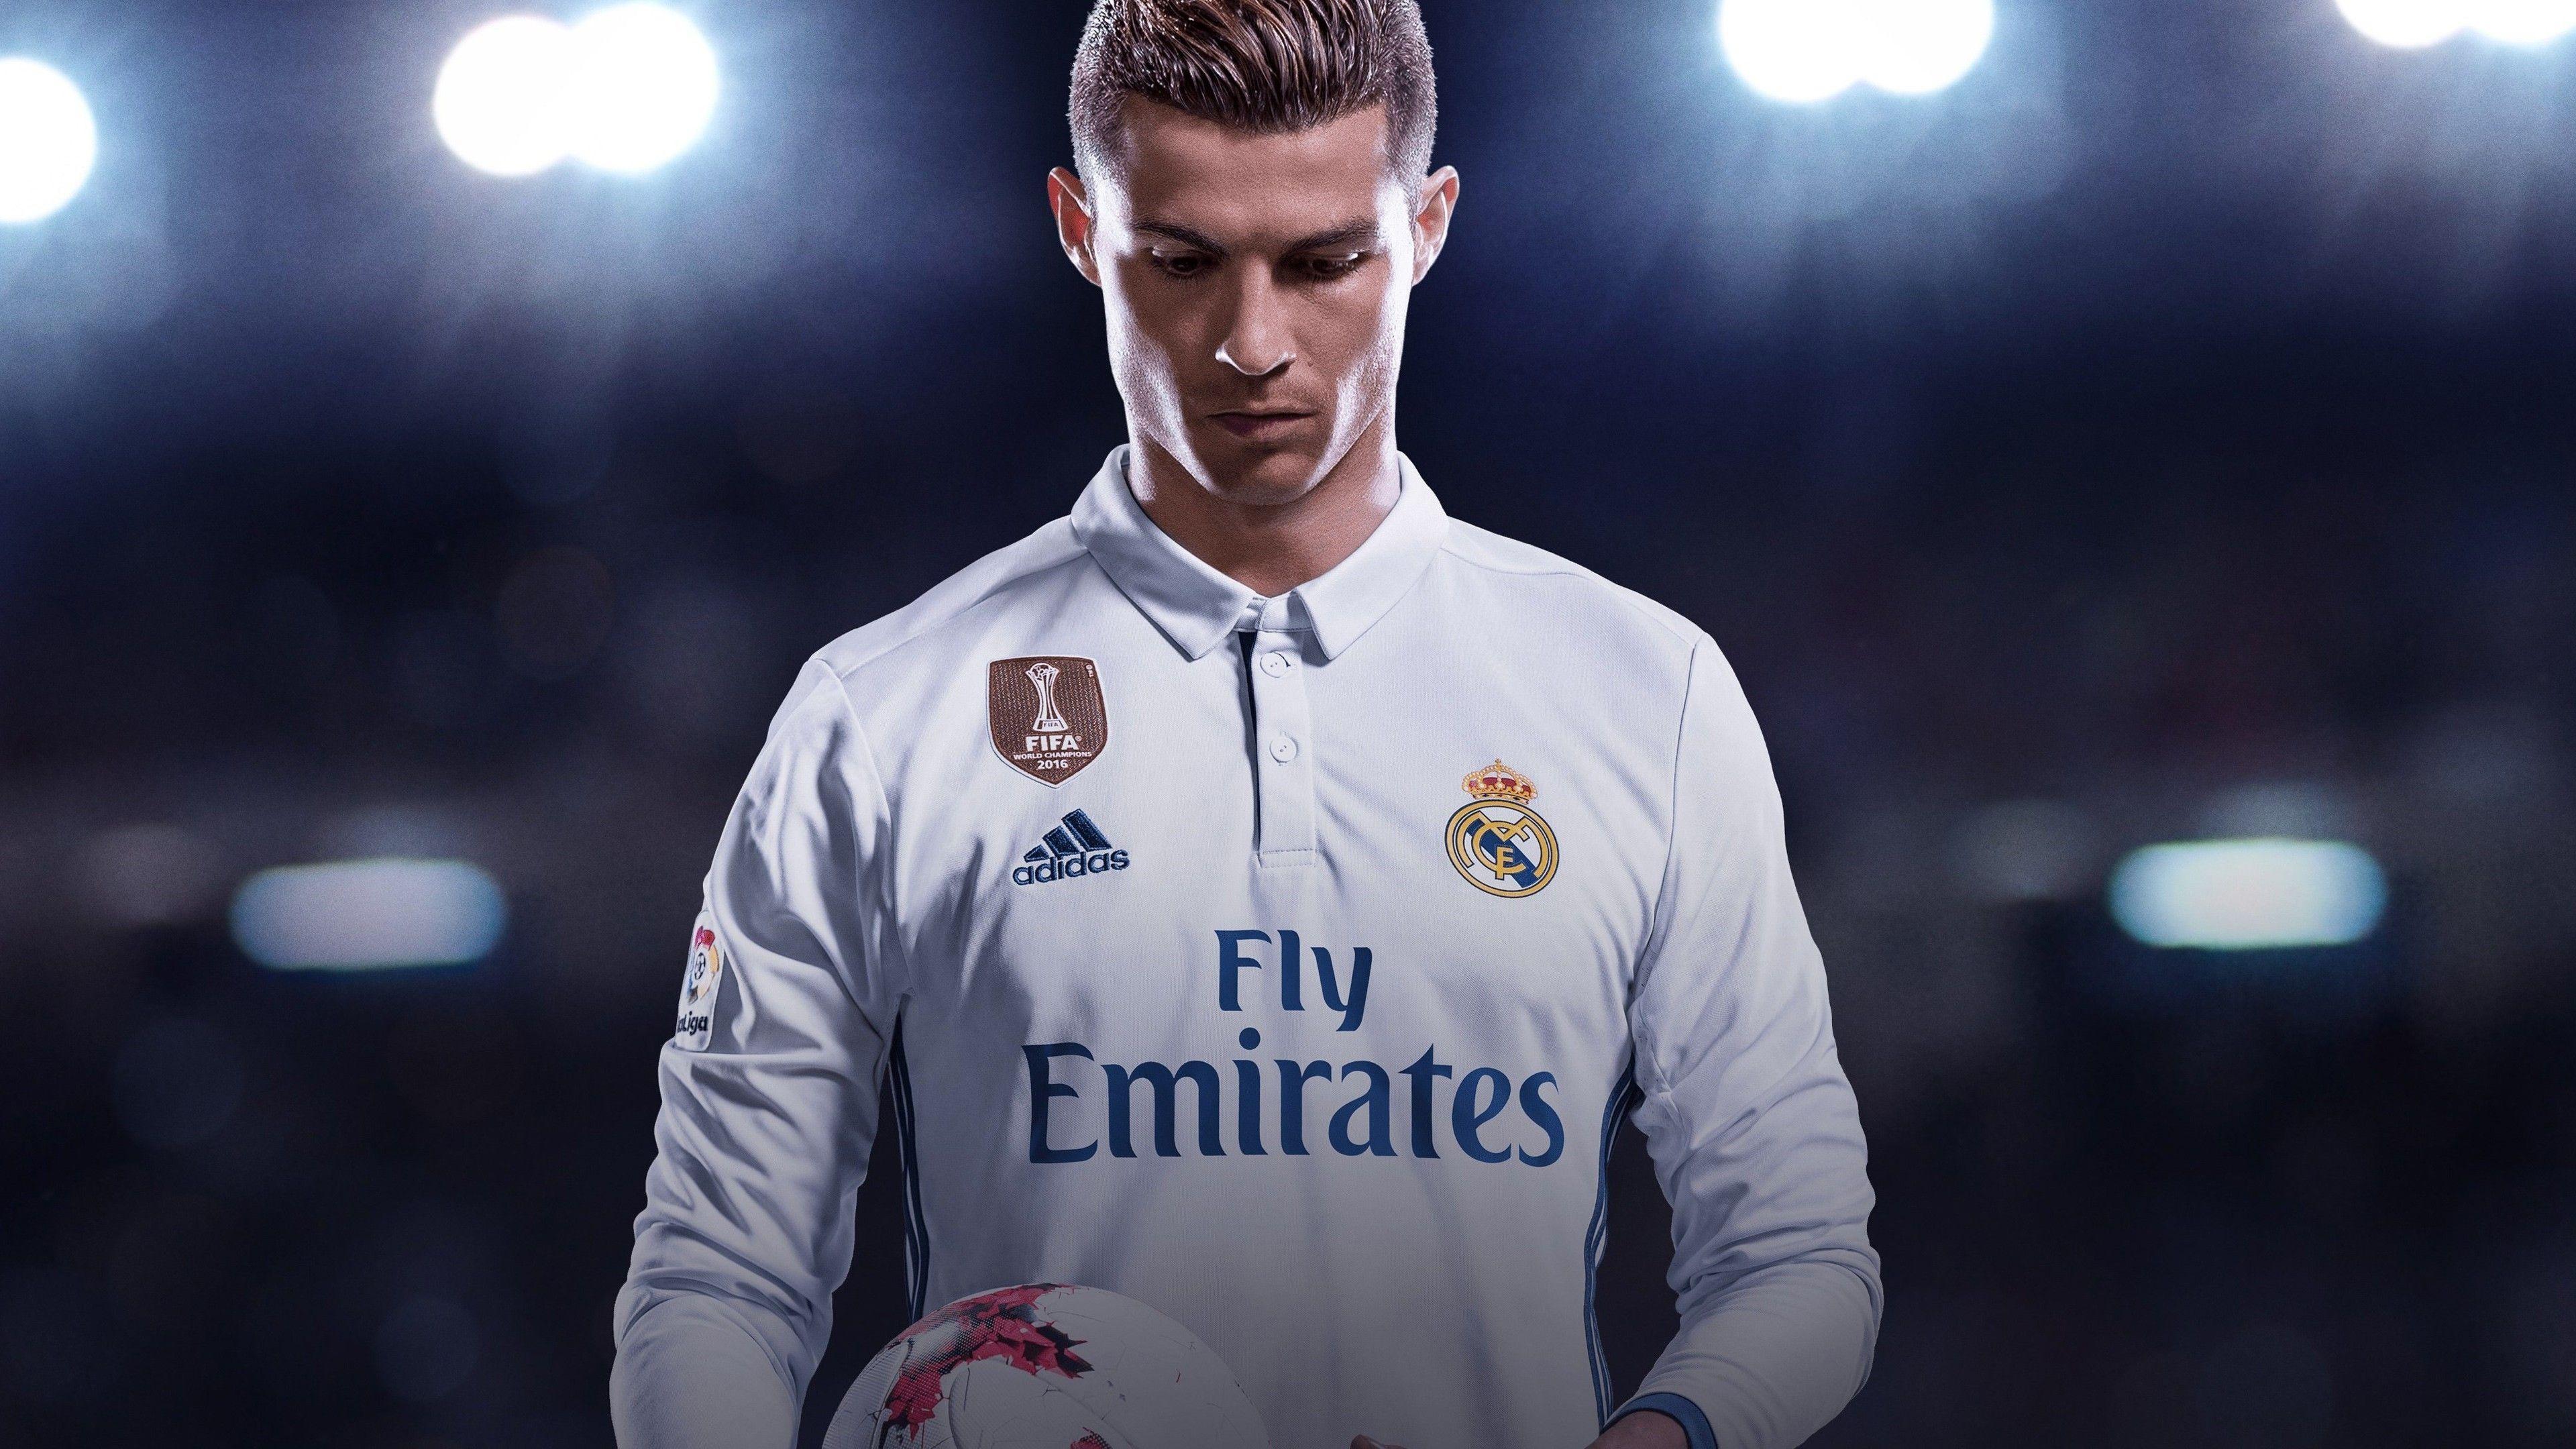 3840x2160 Cristiano Ronaldo Hình nền HD